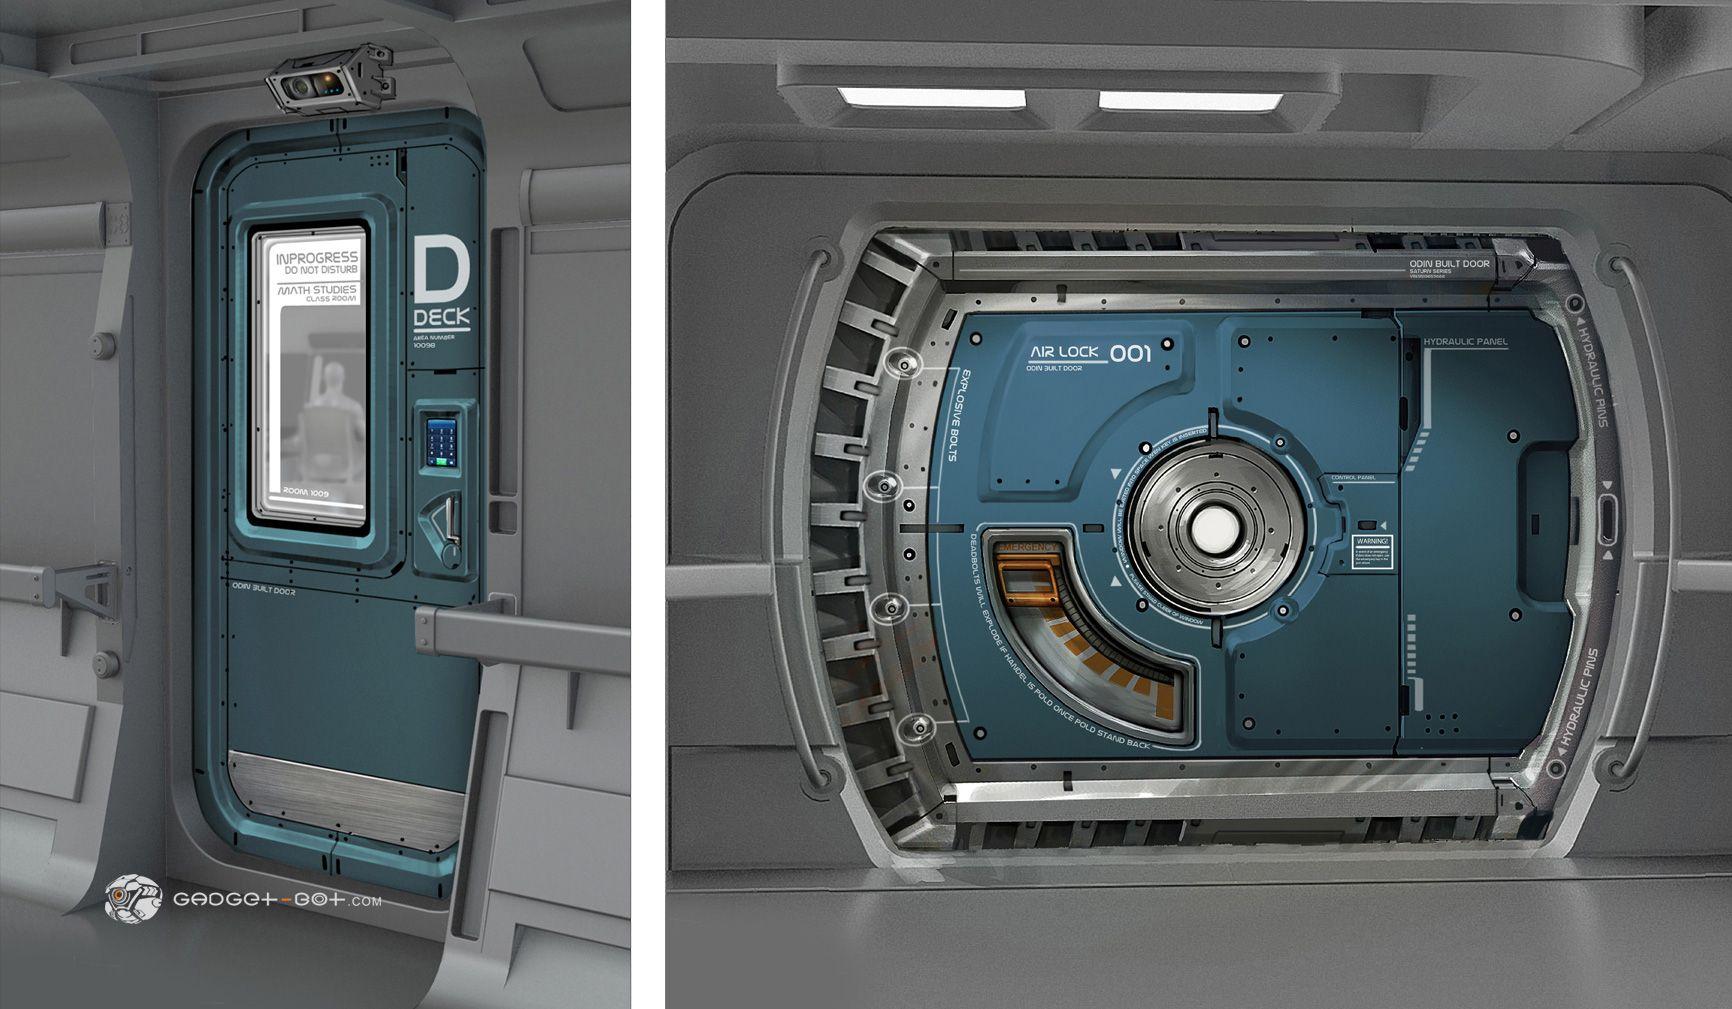 Enders Game Concept Art Gb11 Doors Jpg 1732 1009 Game Concept Art Concept Art